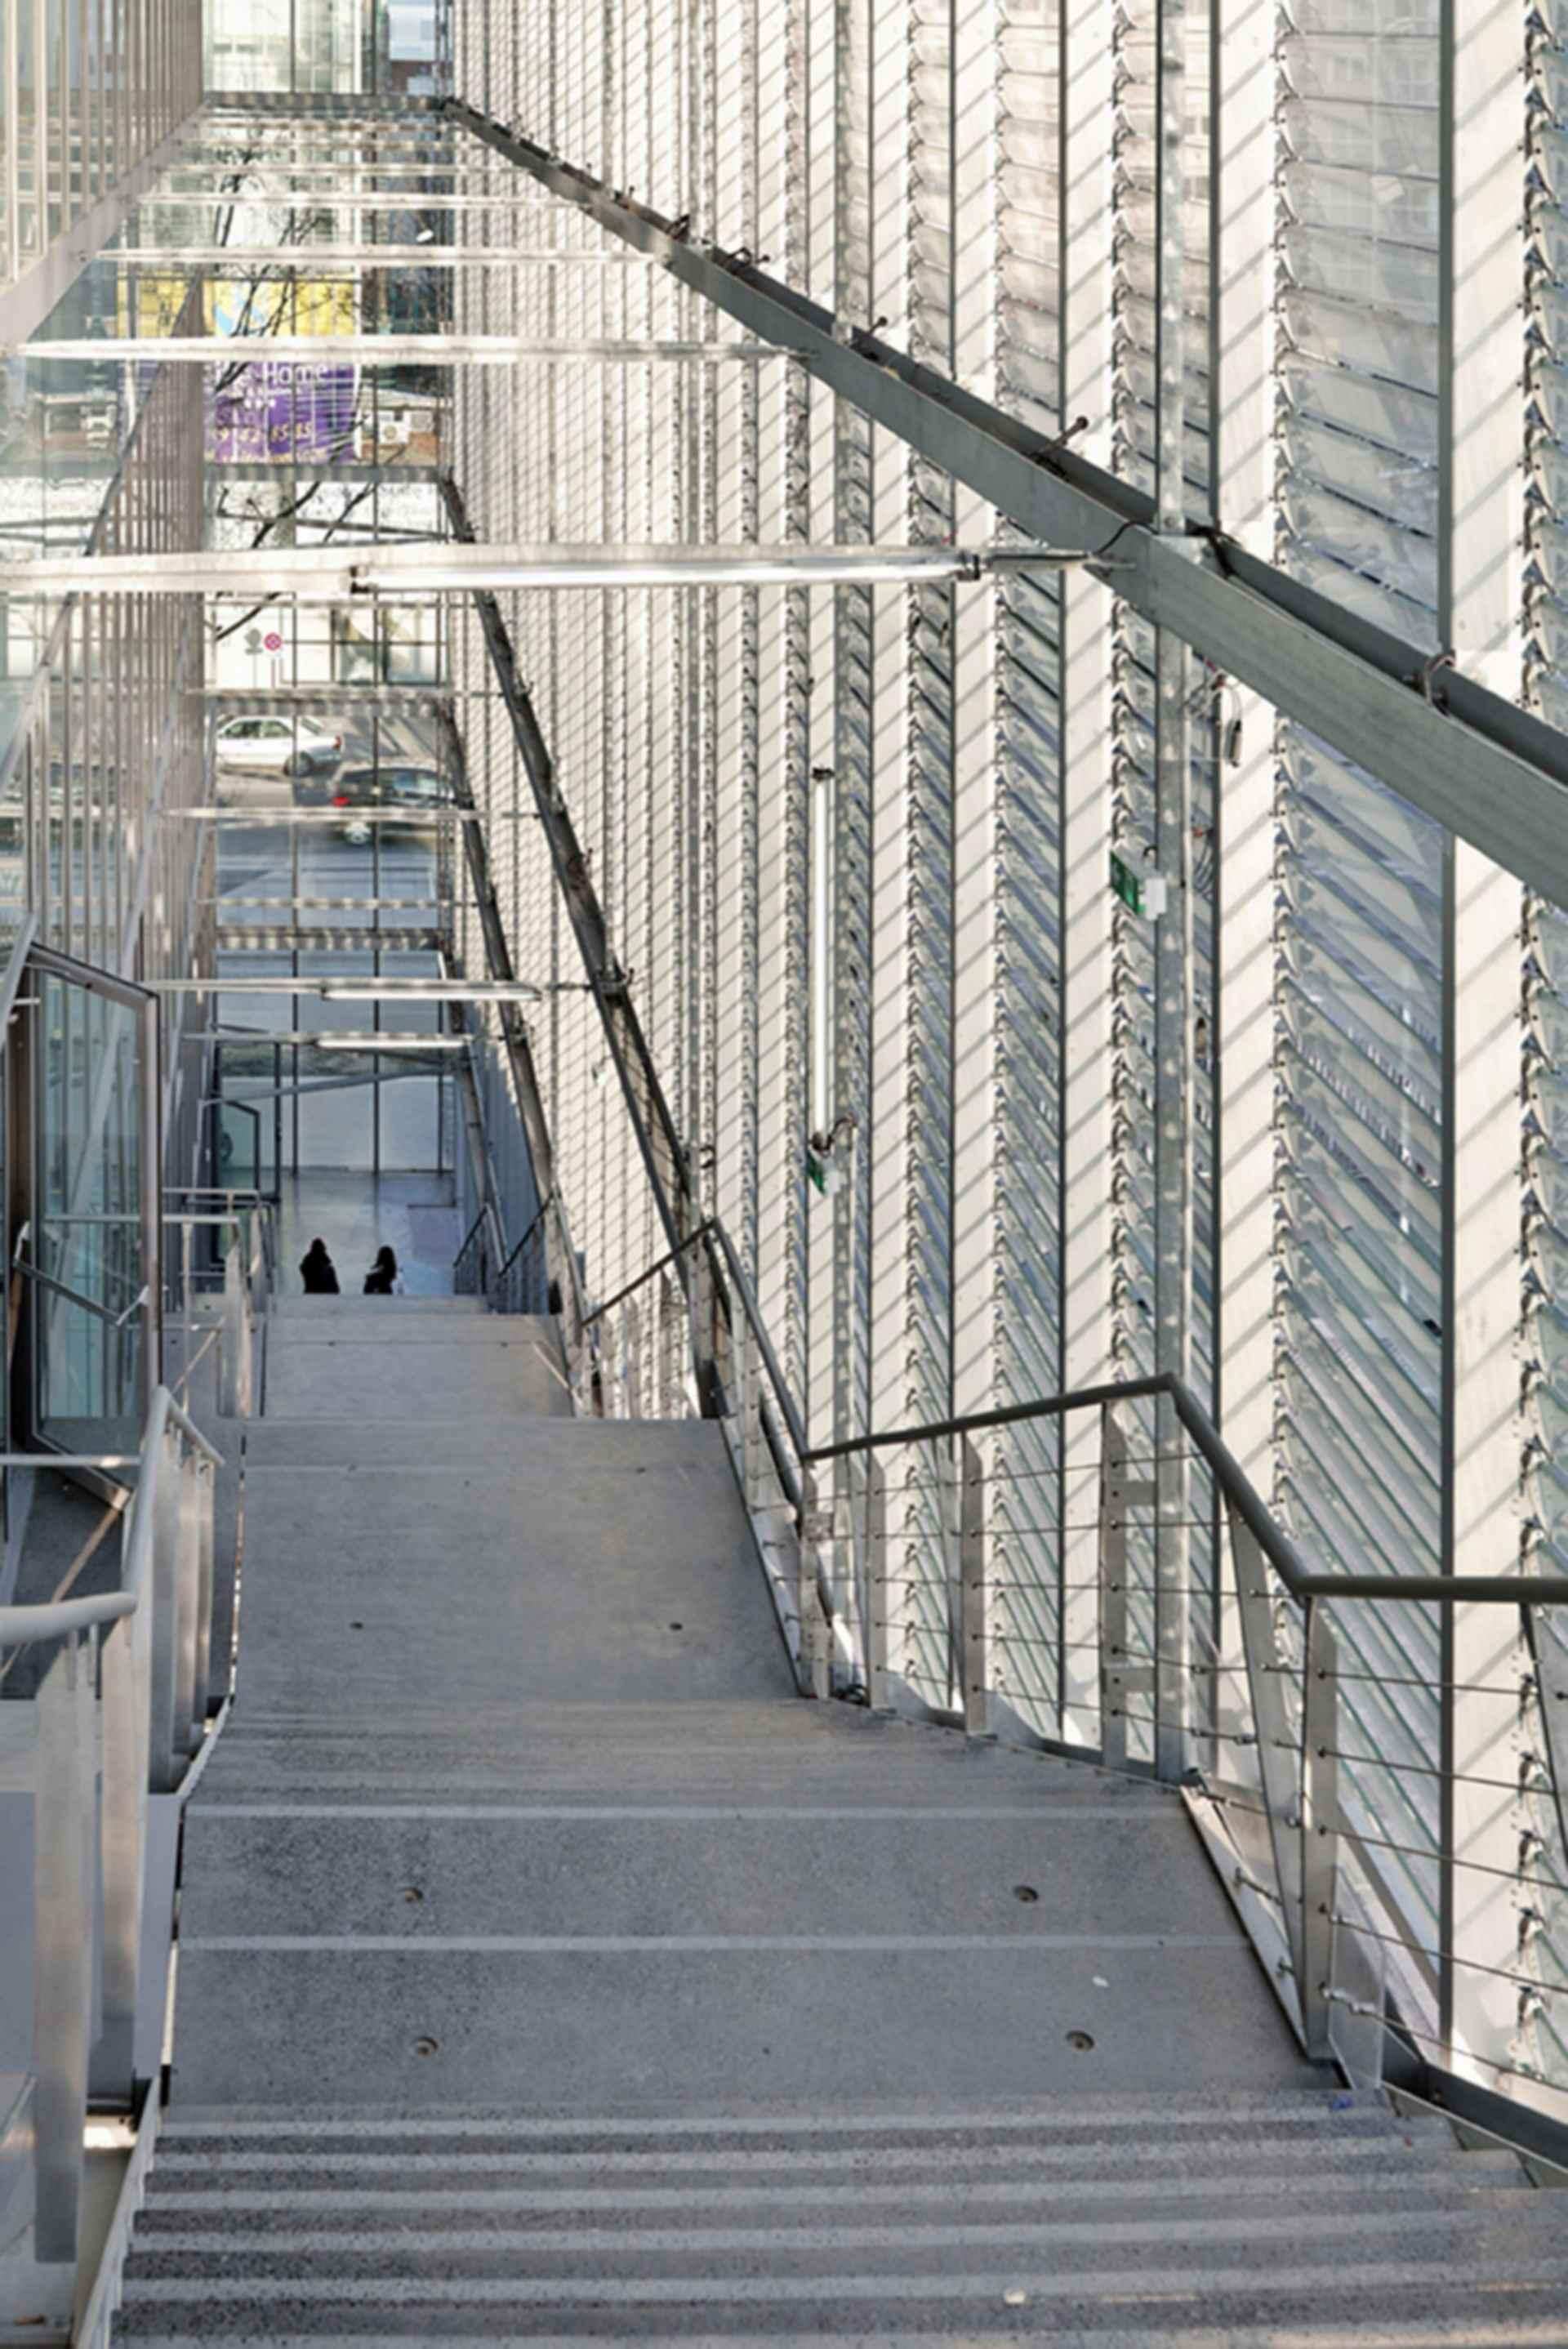 Sports Center Jules Ladoumegue - Stairs